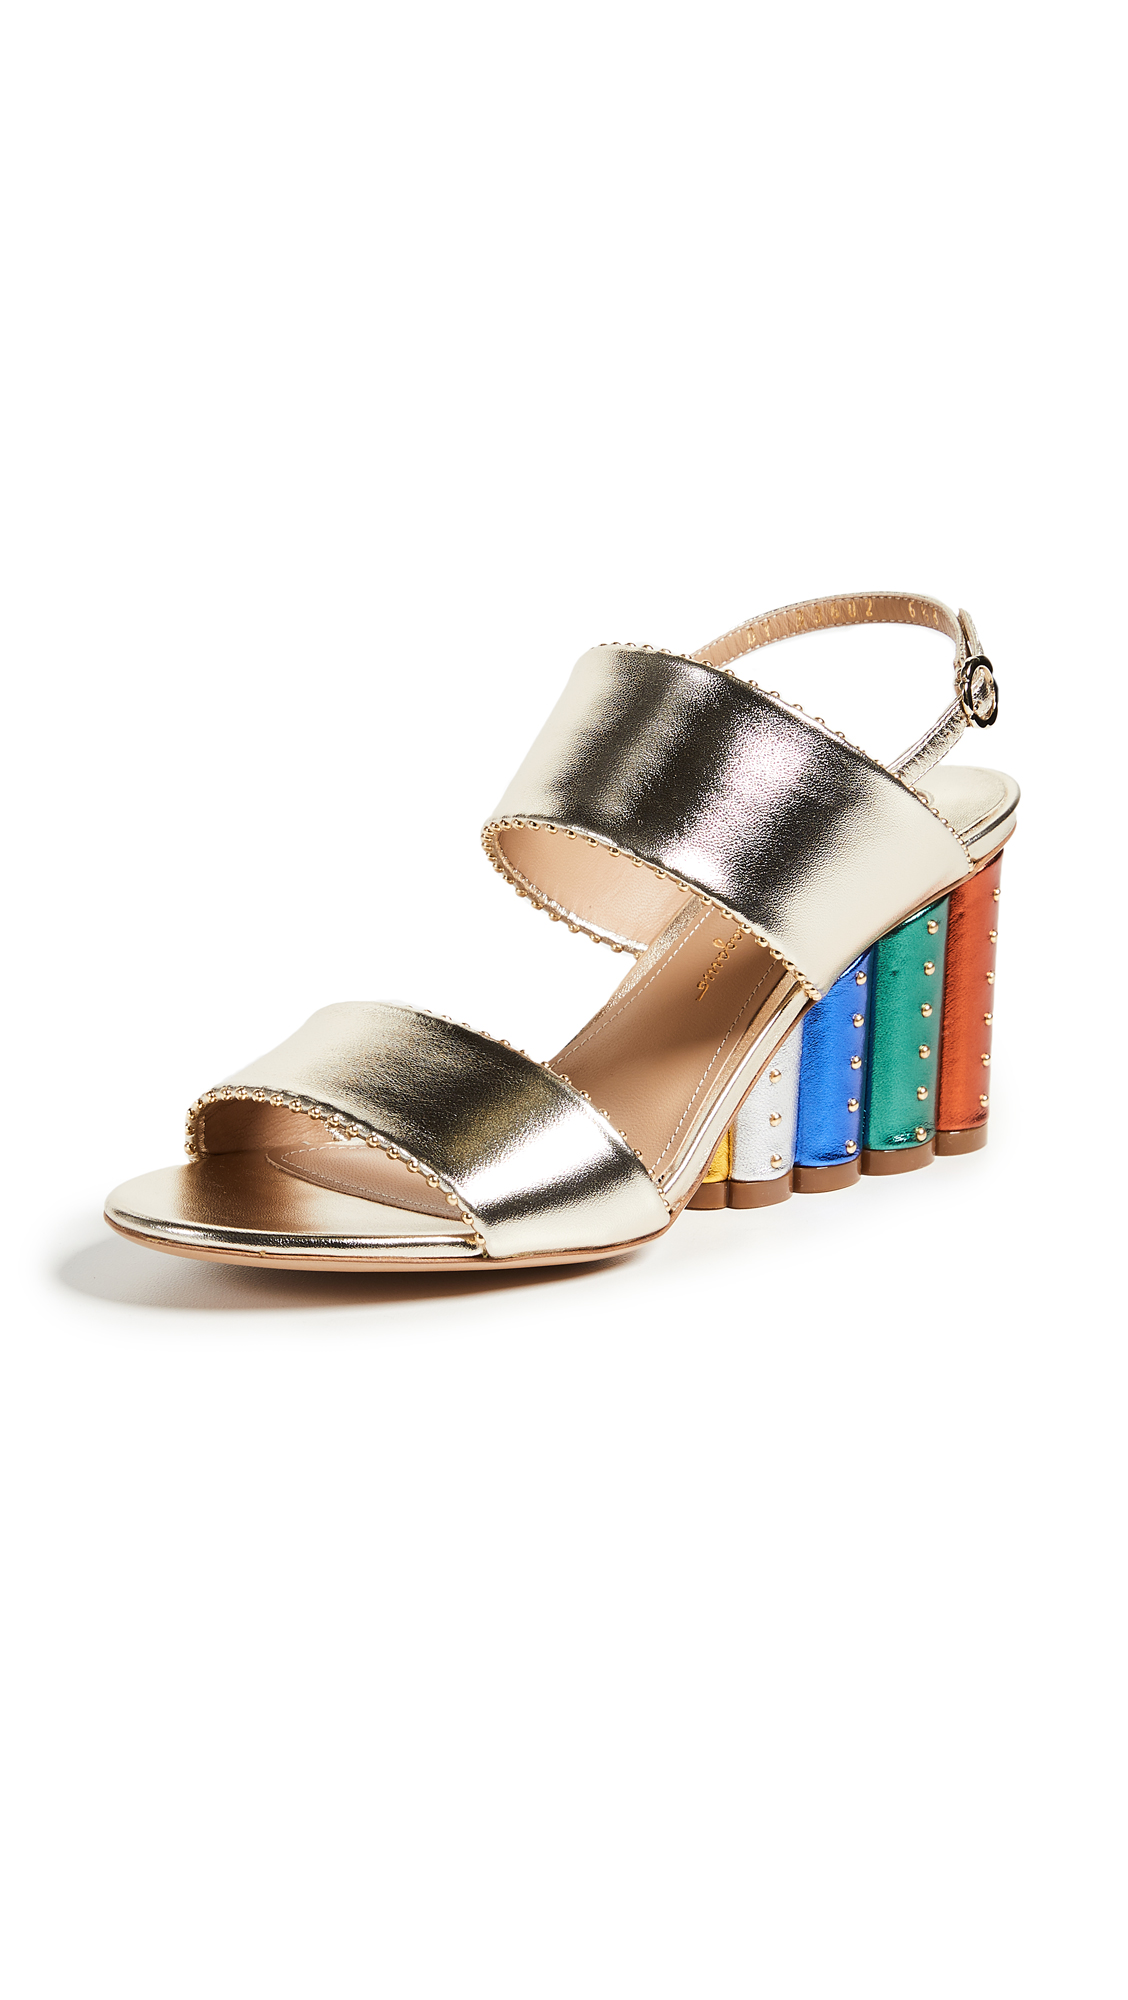 Salvatore Ferragamo Gavi Sandals - Oro Rainbow